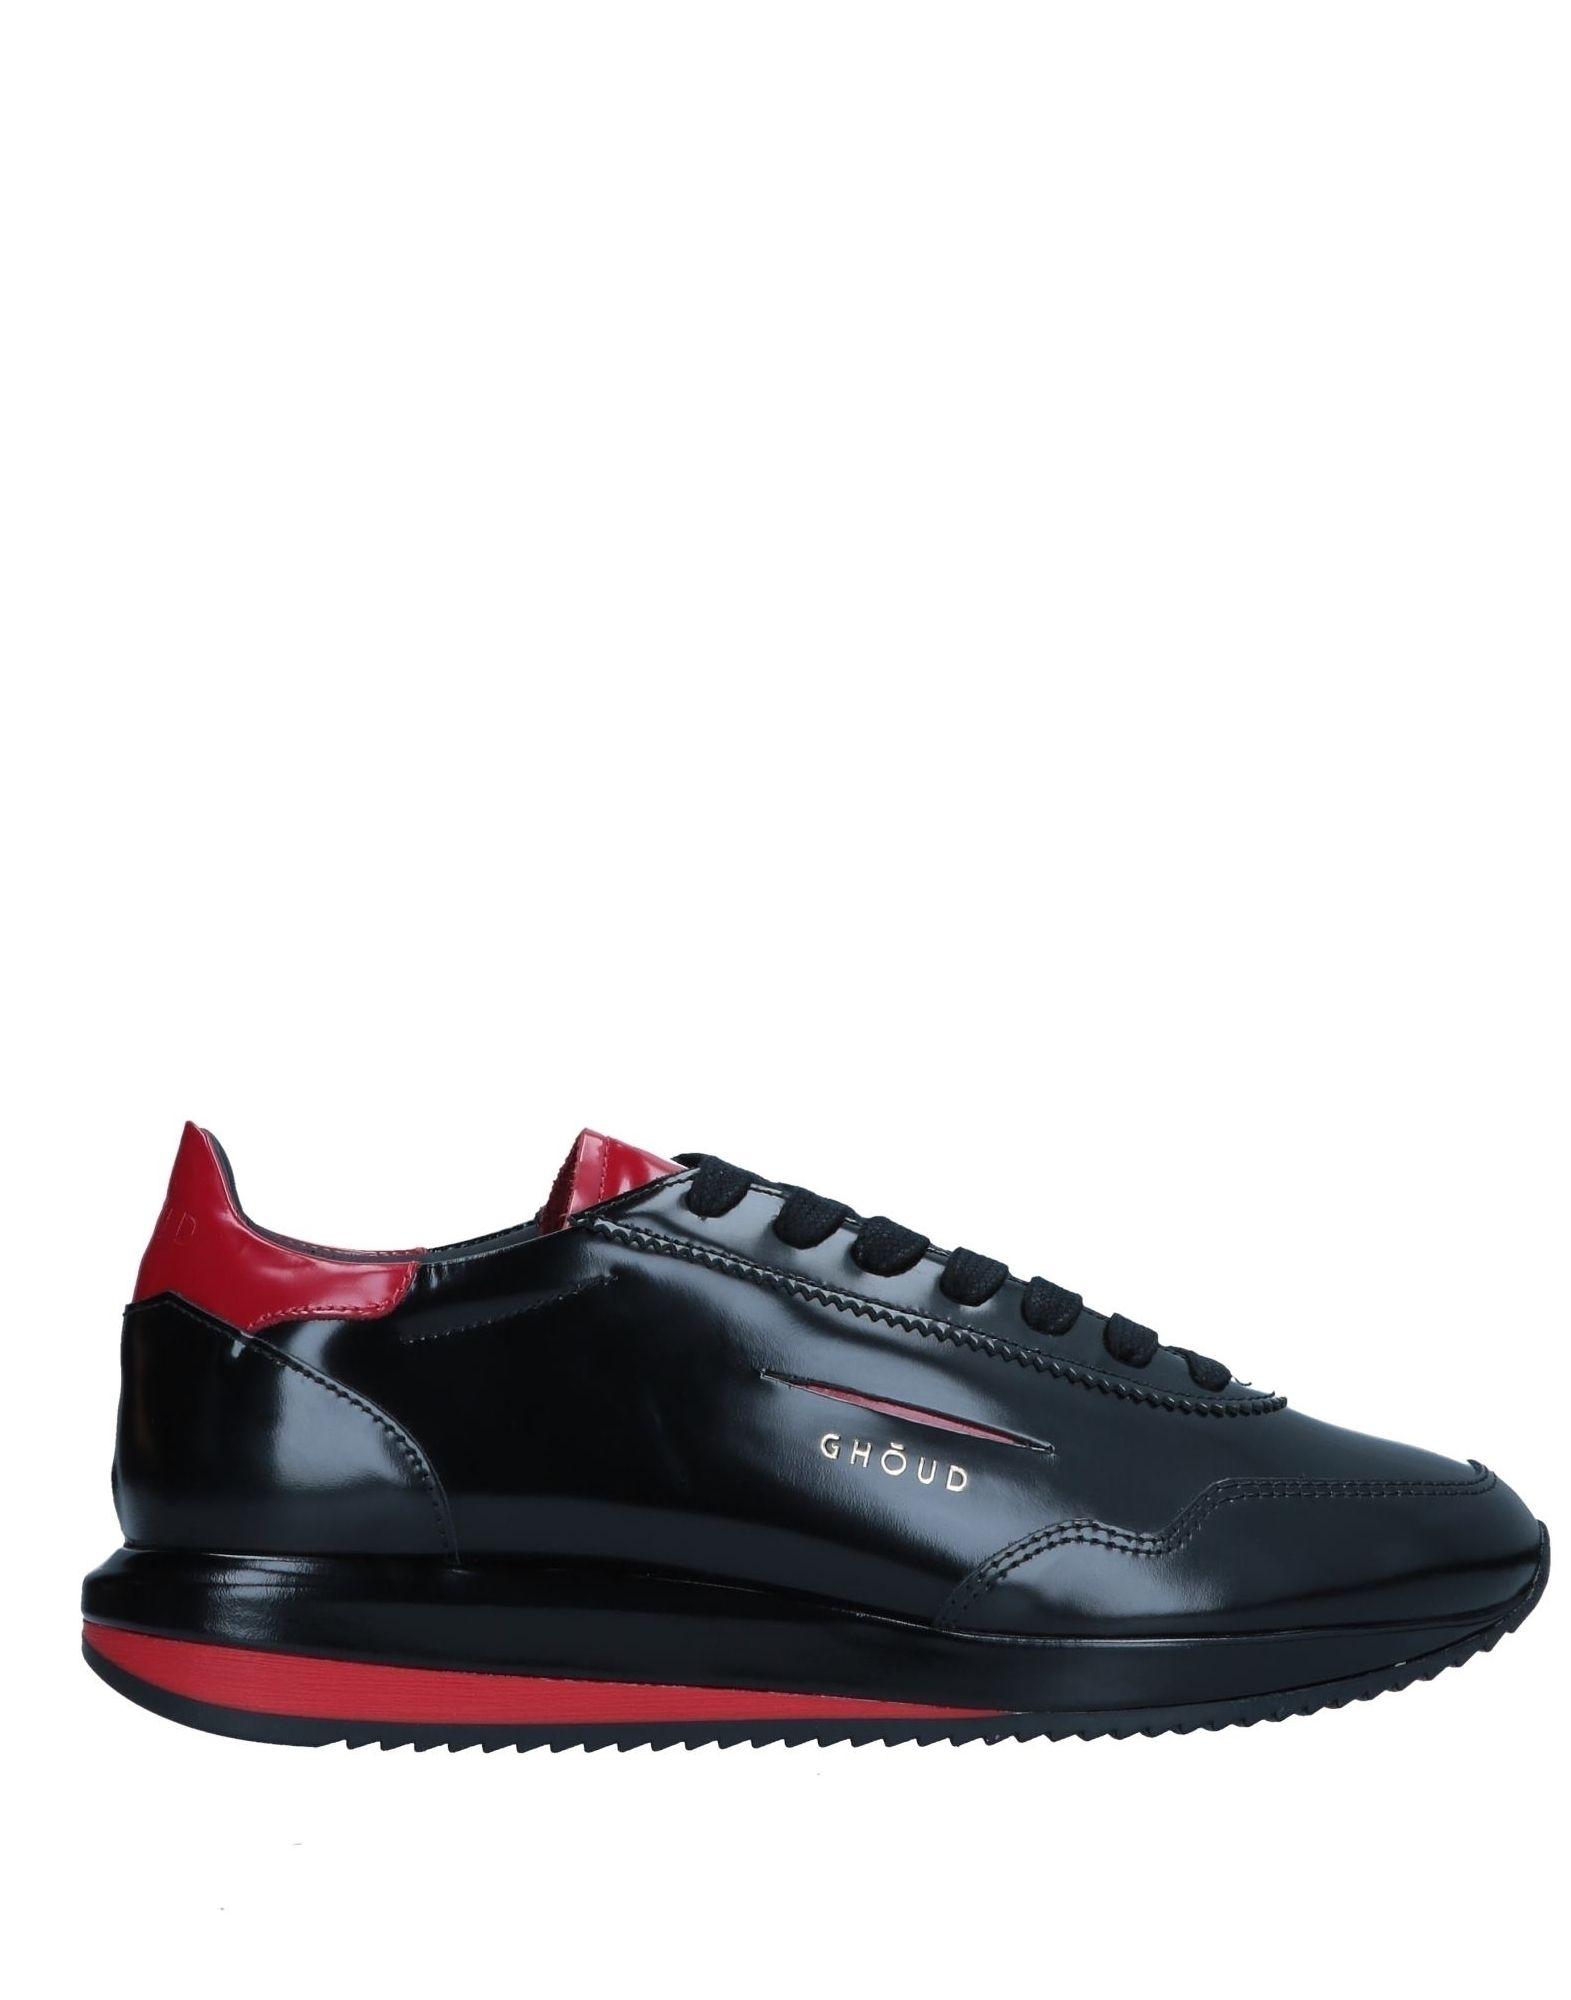 Ghōud Venice Sneakers Damen  11545441FEGut aussehende strapazierfähige Schuhe